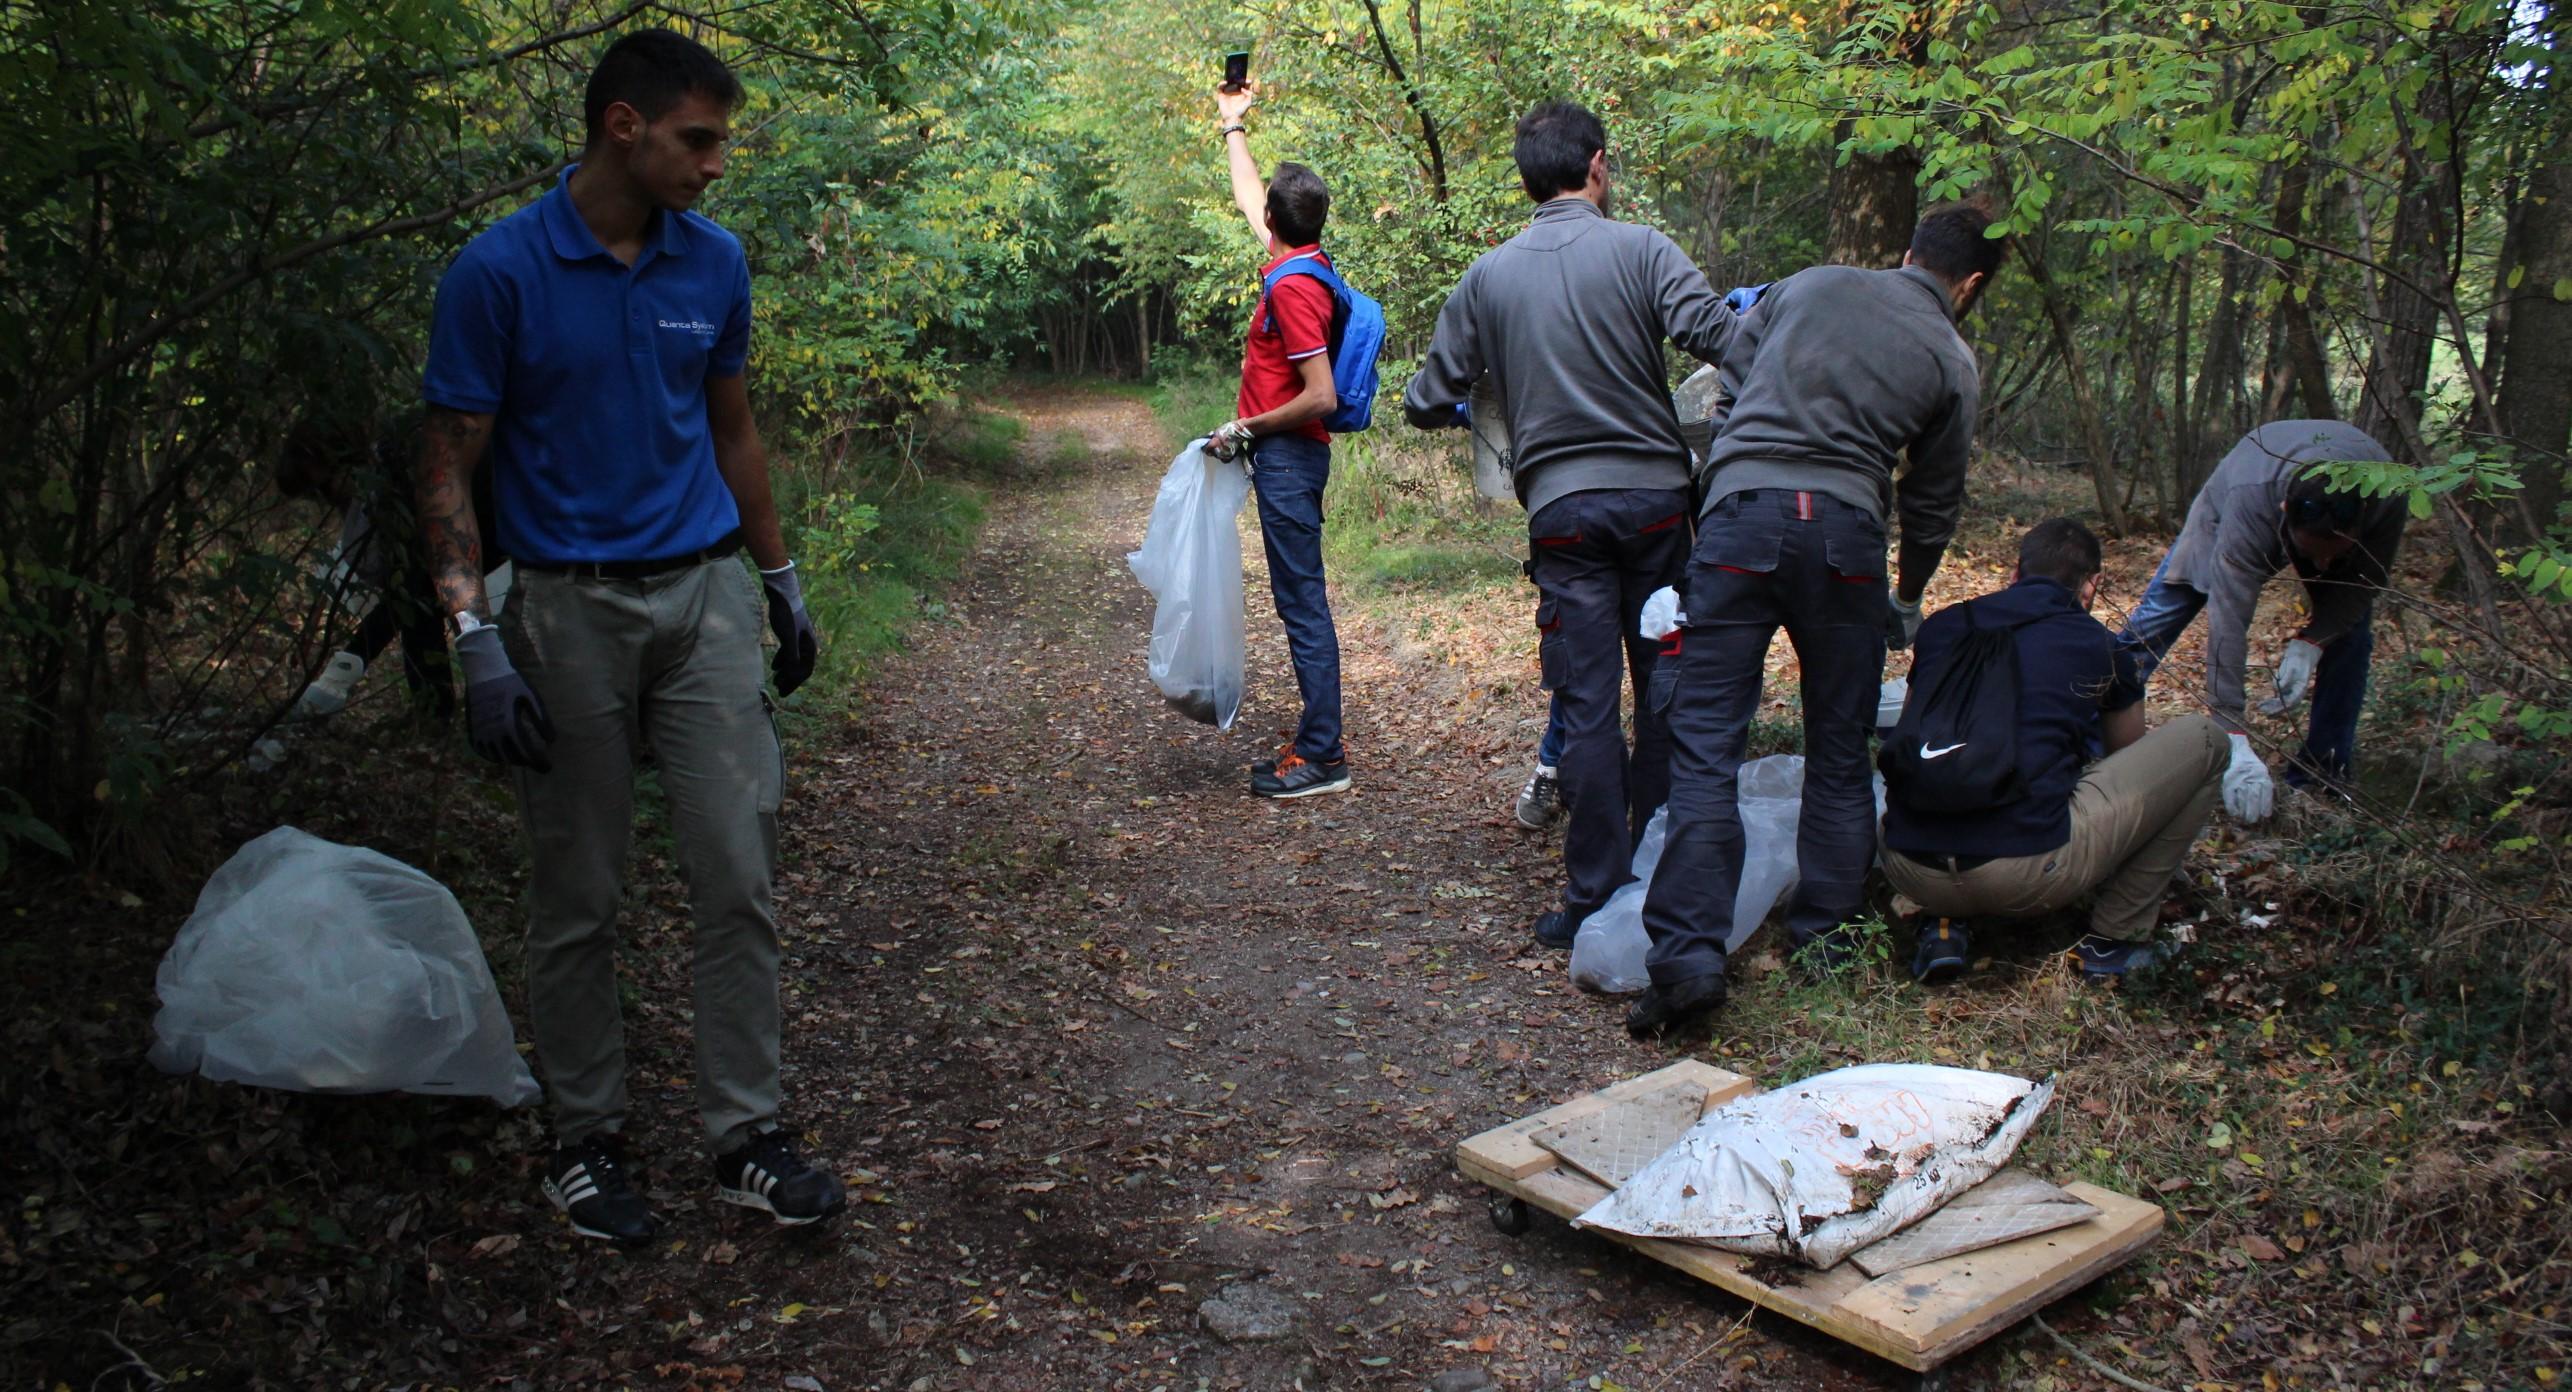 samarate quanta volontari rifiuti